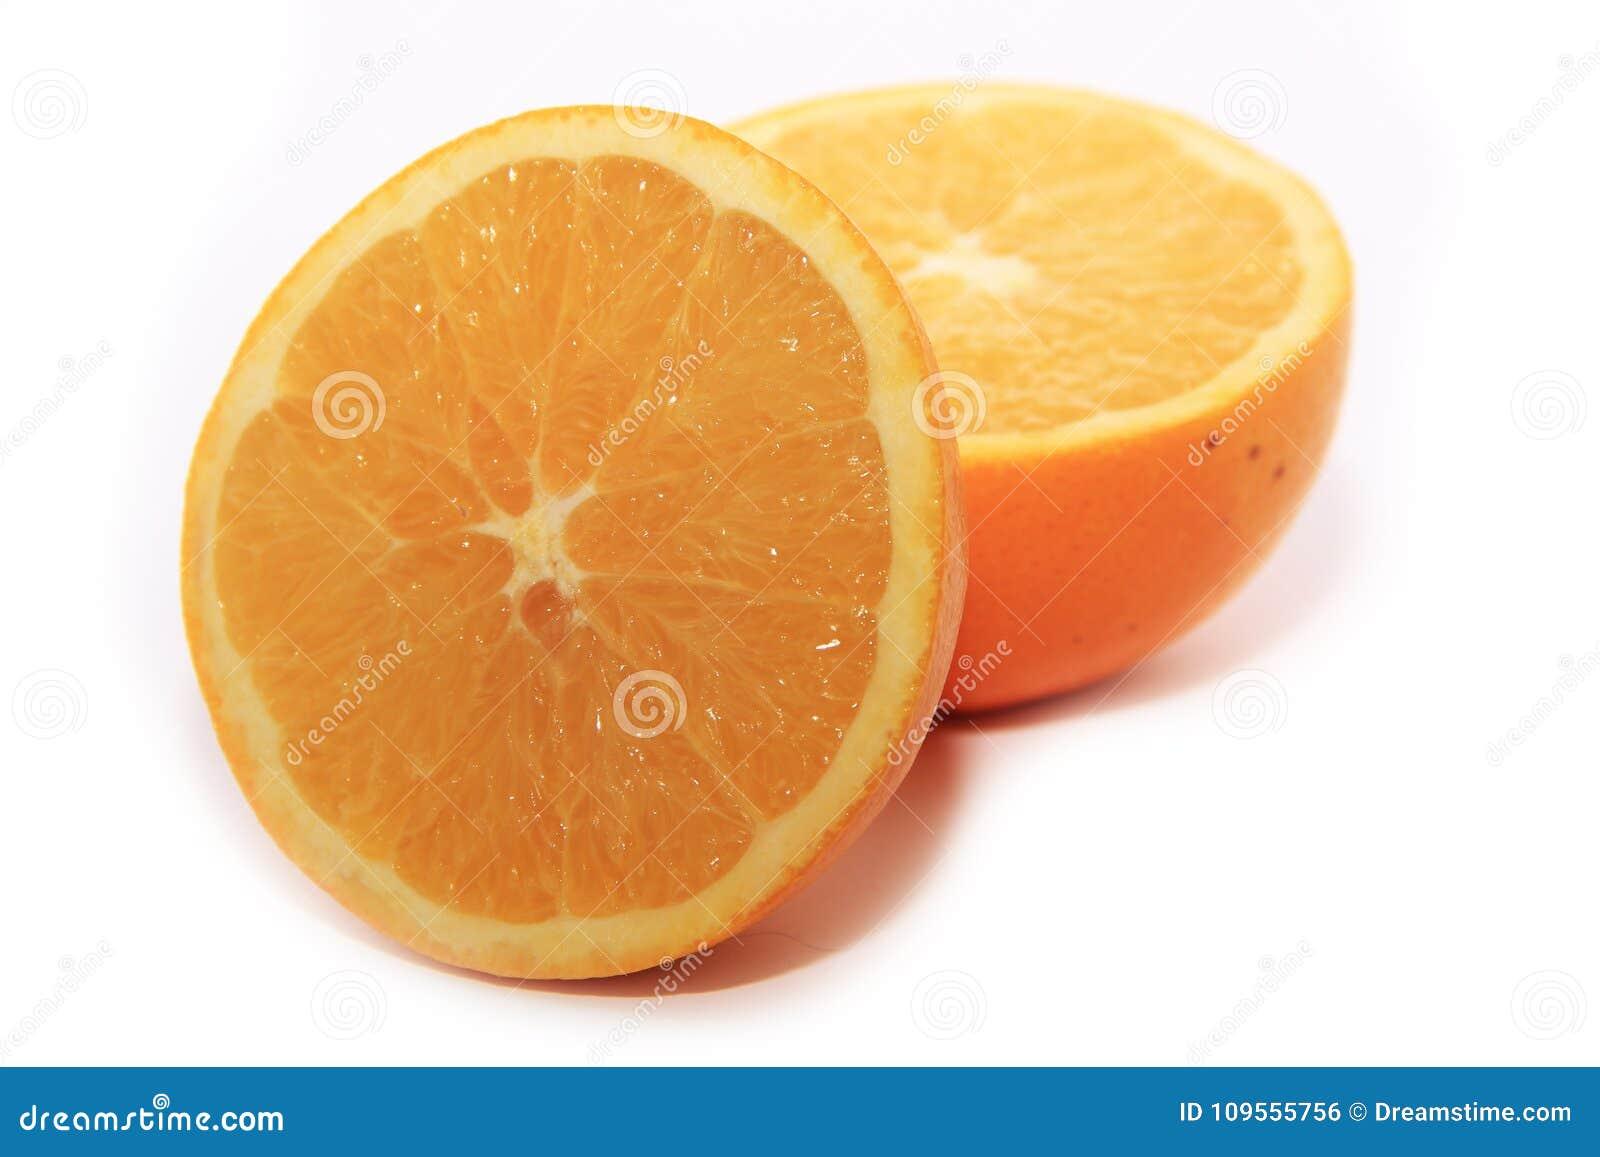 Saftigt apelsinsnitt in i halvor på en vit bakgrund